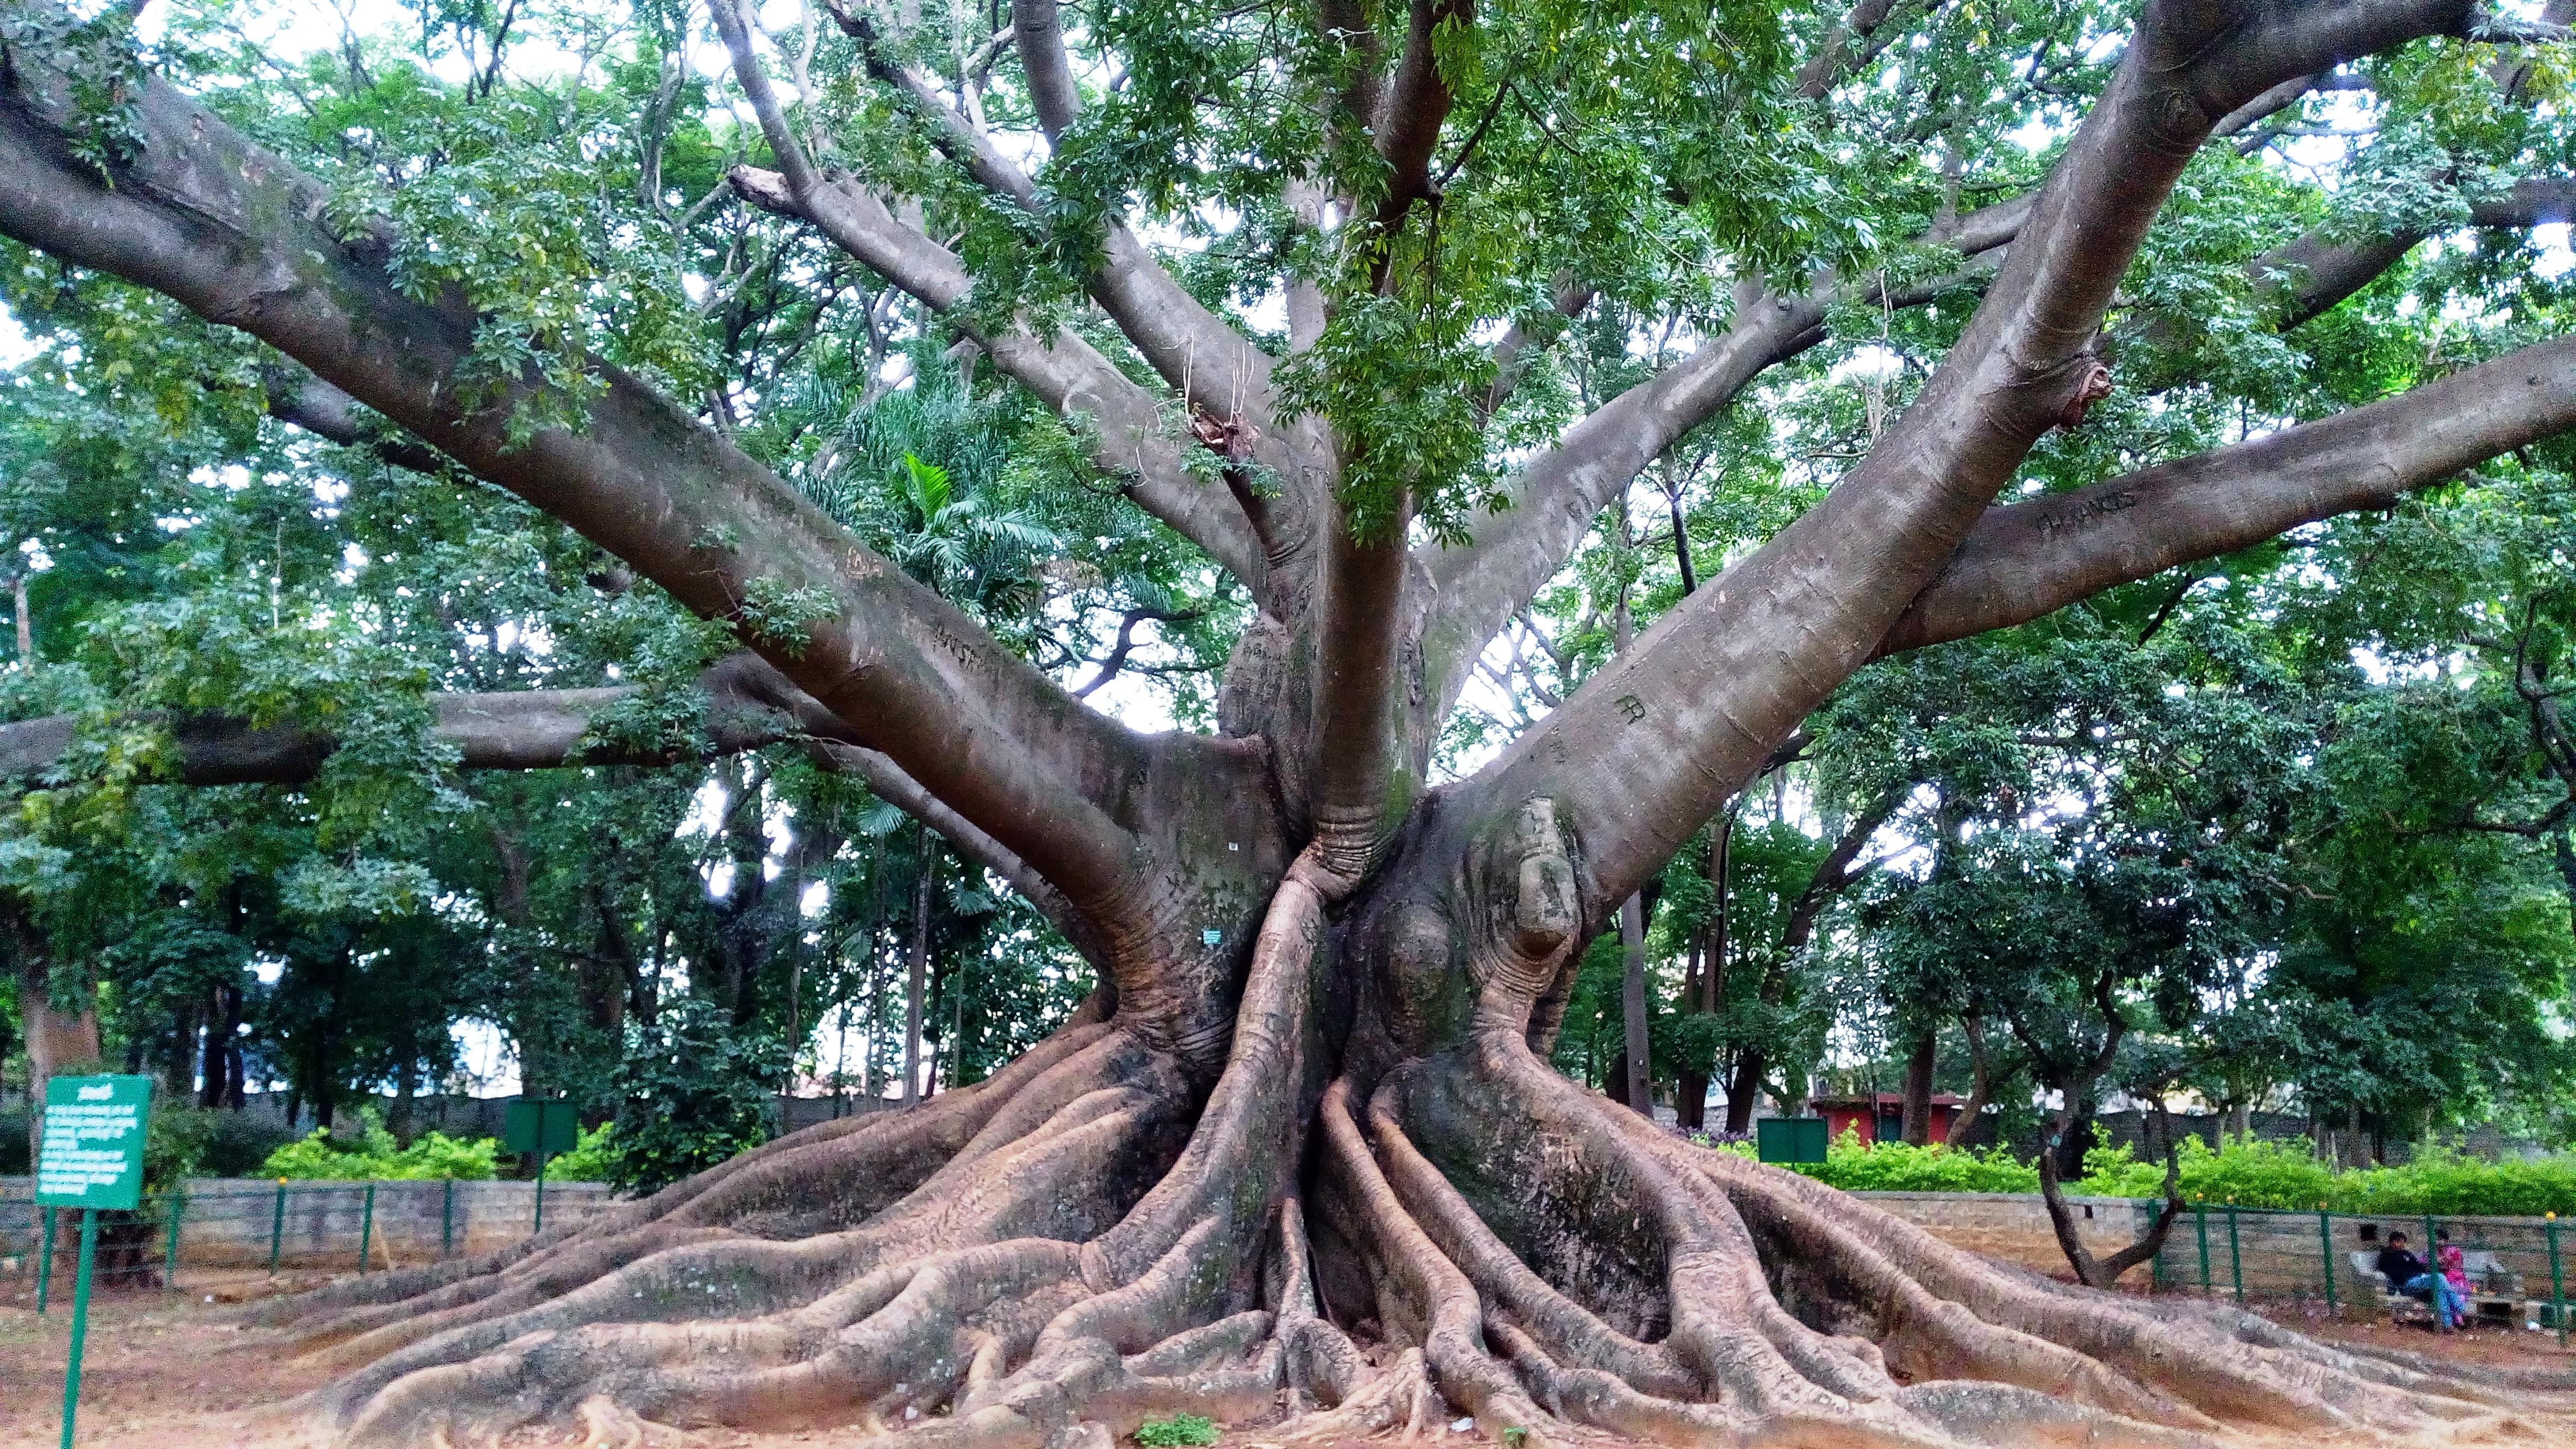 Incroyable File:White Silk Cotton Tree, Lalbagh Botanical Garden, Bangalore